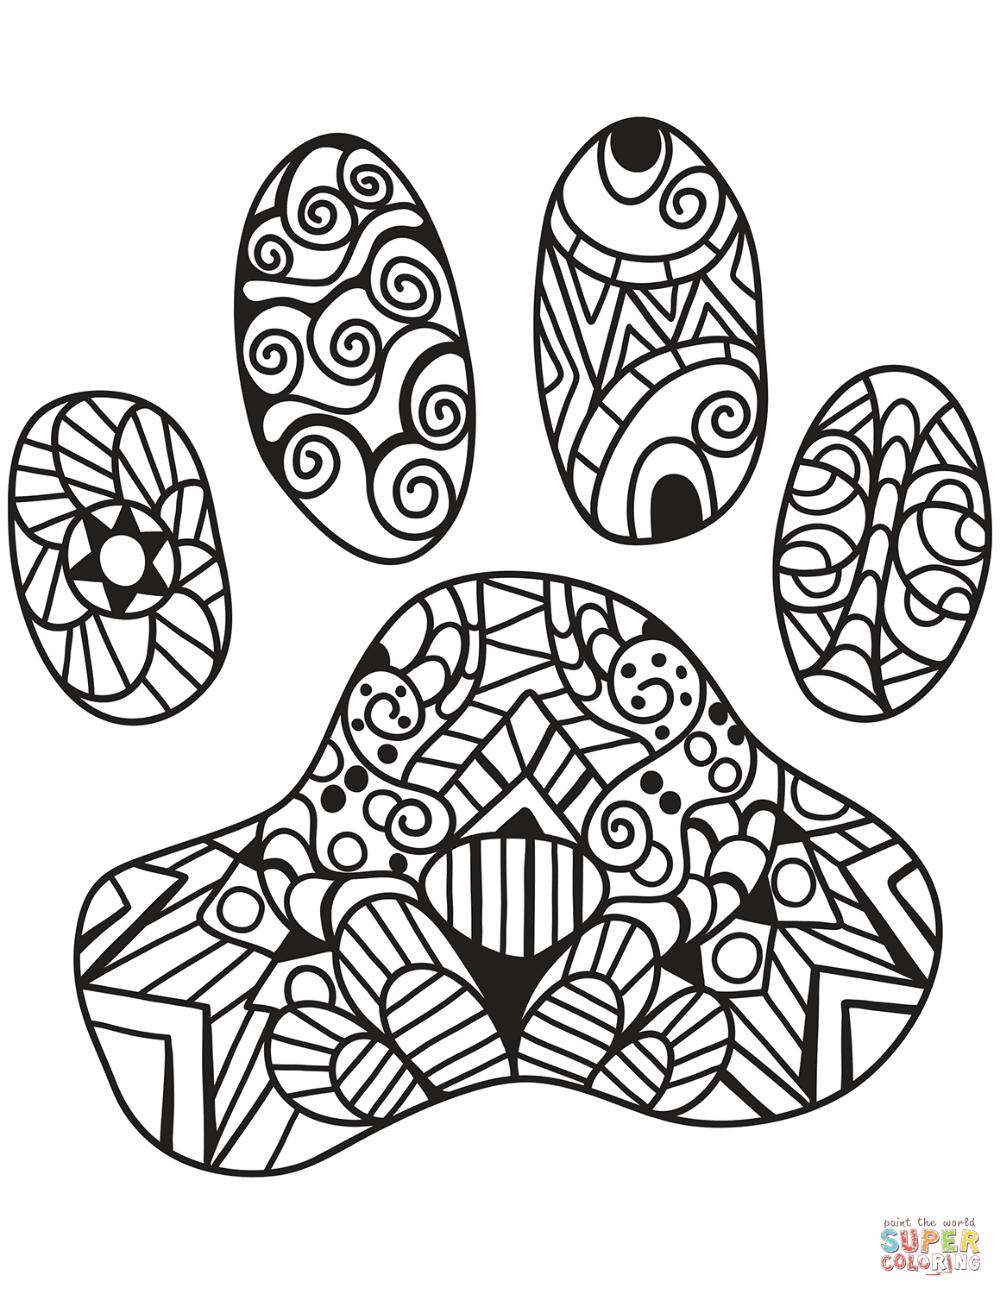 Cat Paw Print Zentangle Coloring Page Free Printable Coloring Pages Paw Print Drawing Cat Paw Print Dog Paw Print